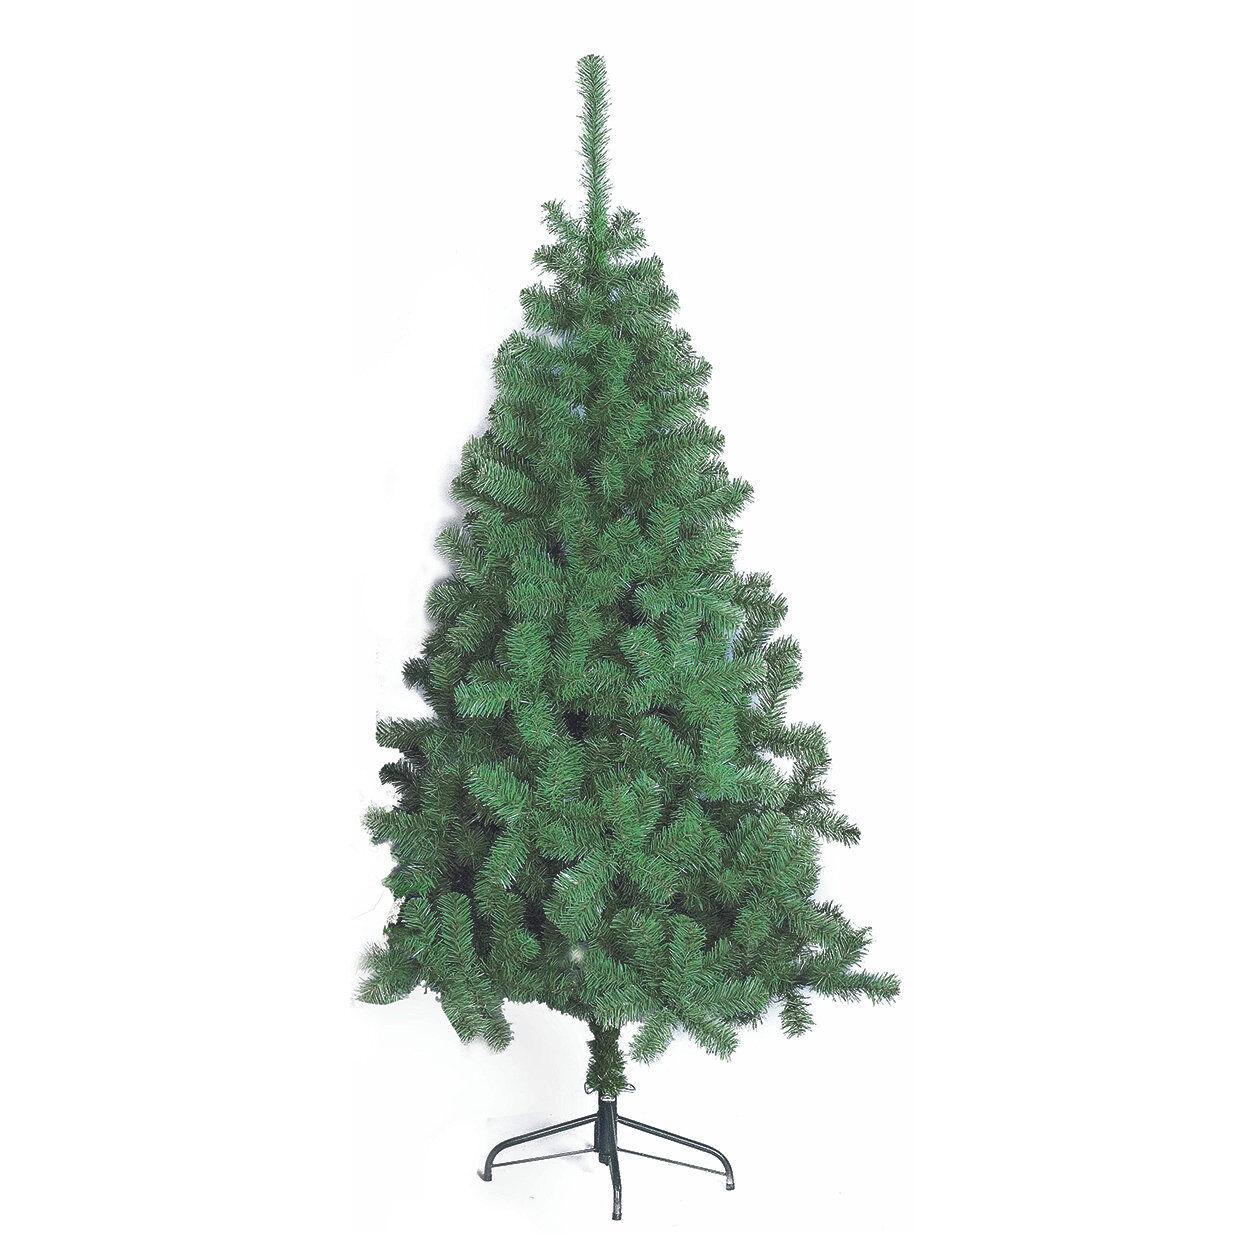 alberi di natale albero di natale alice, h150, 289 rami, verde